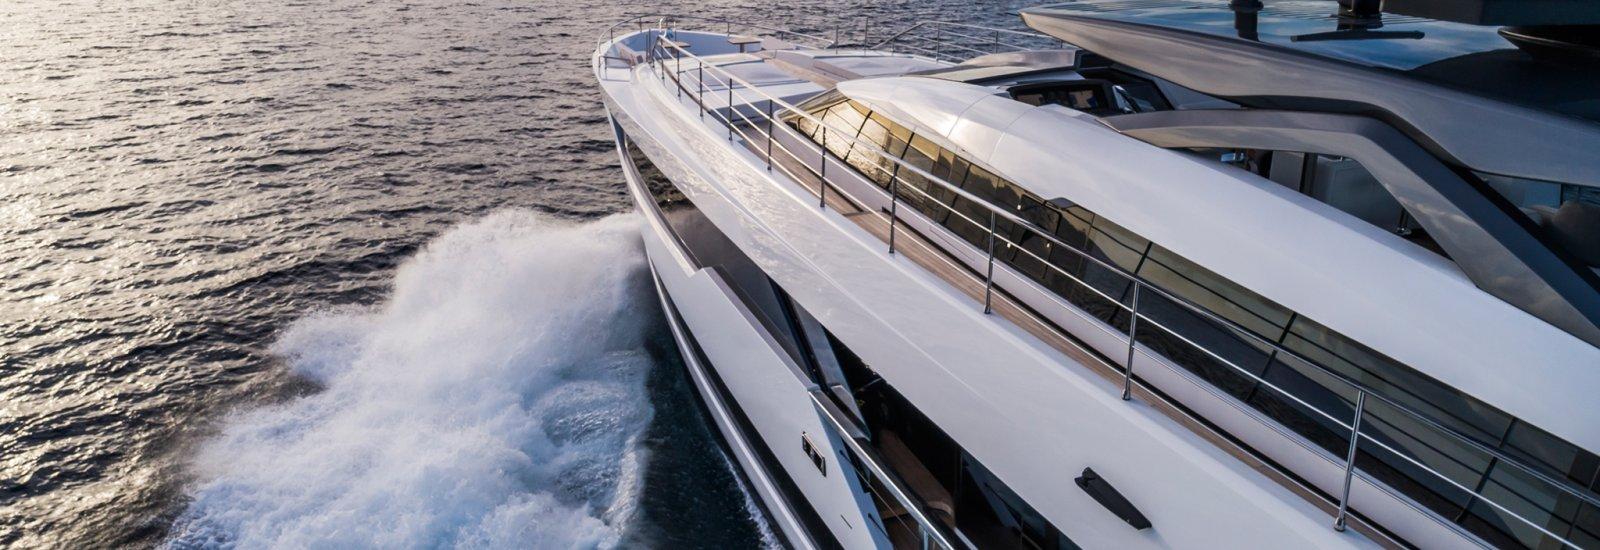 JMA Yachting Port Fréjus Vente Location Bateaux neufs Ferretti Group - Ferretti Yachts et occasions